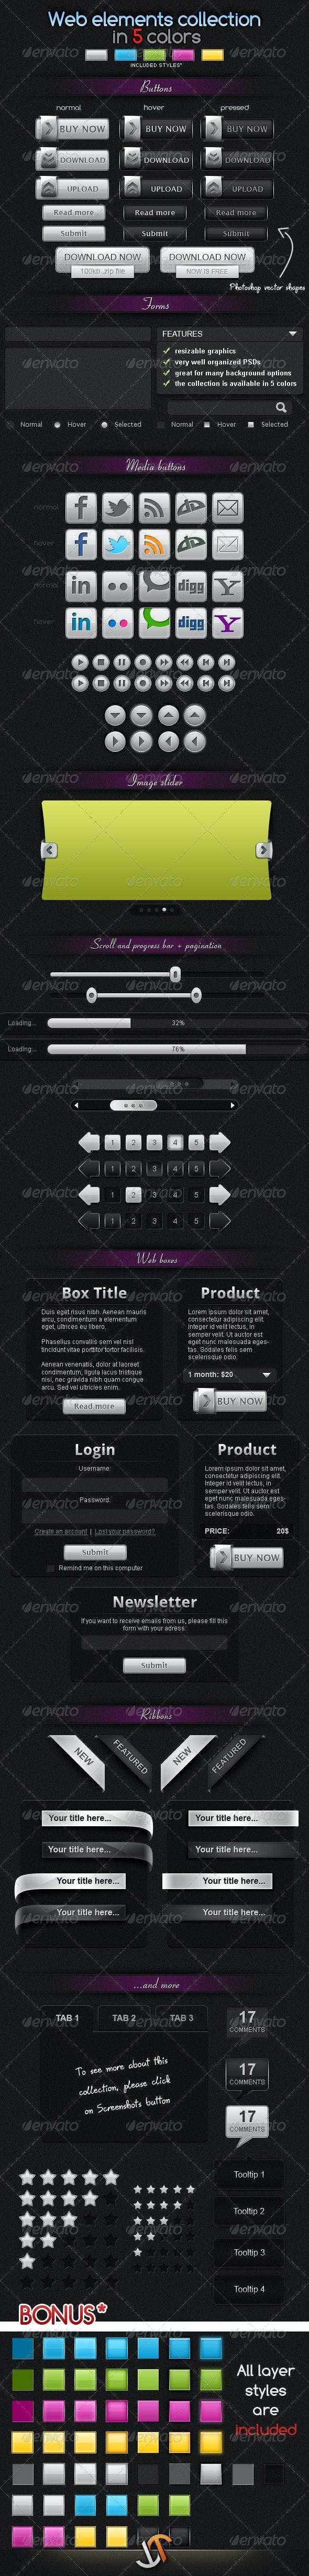 Web elements collection - in 5 colors - Miscellaneous Web Elements